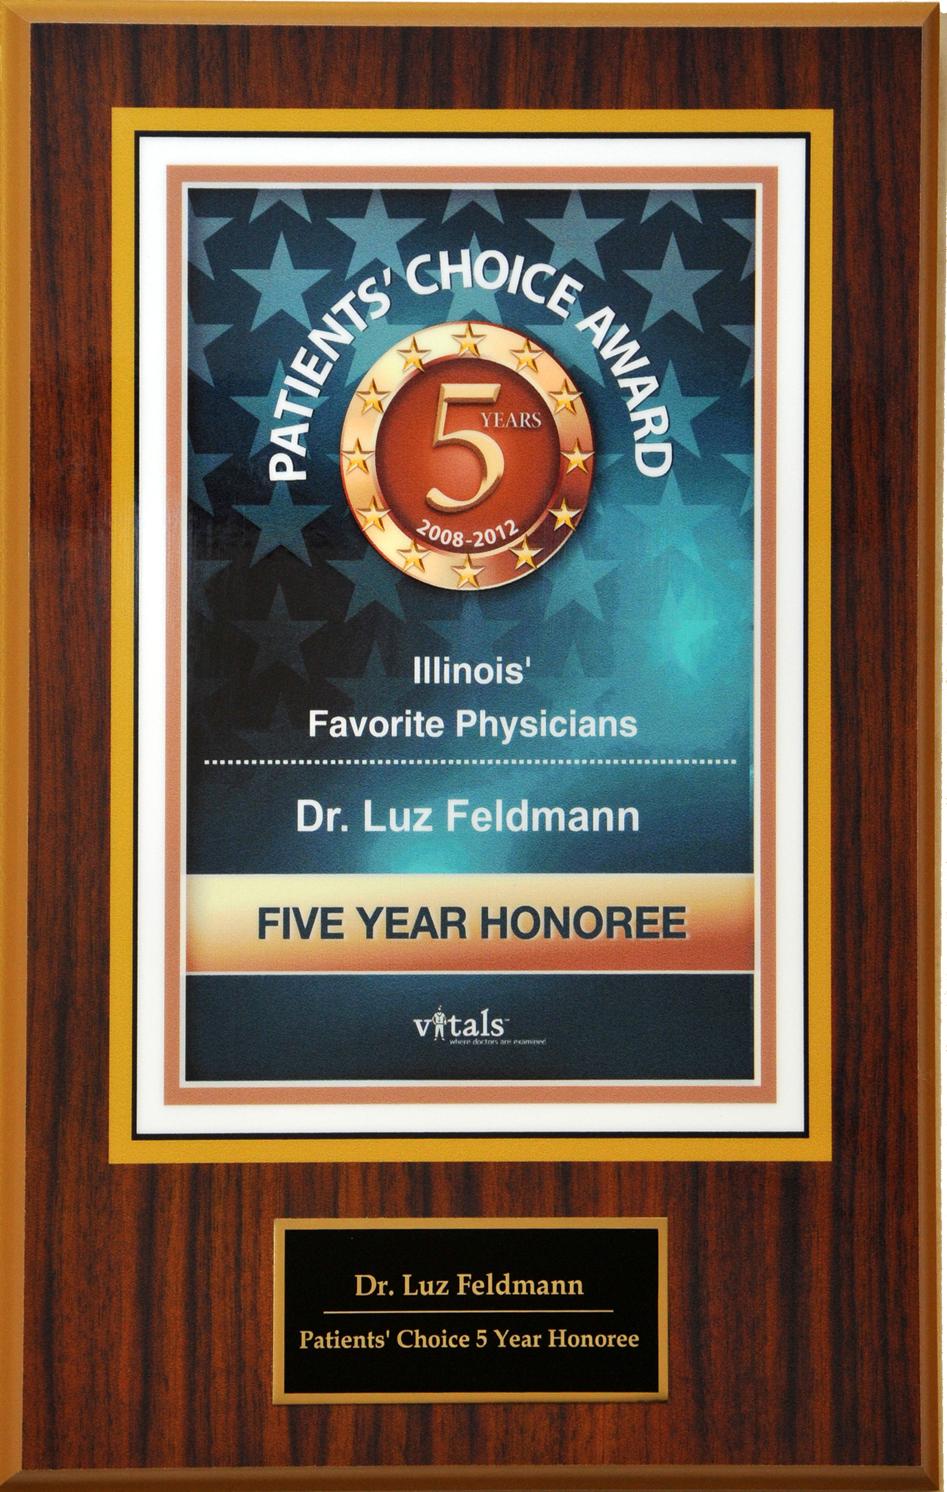 Click Award to Enlarge